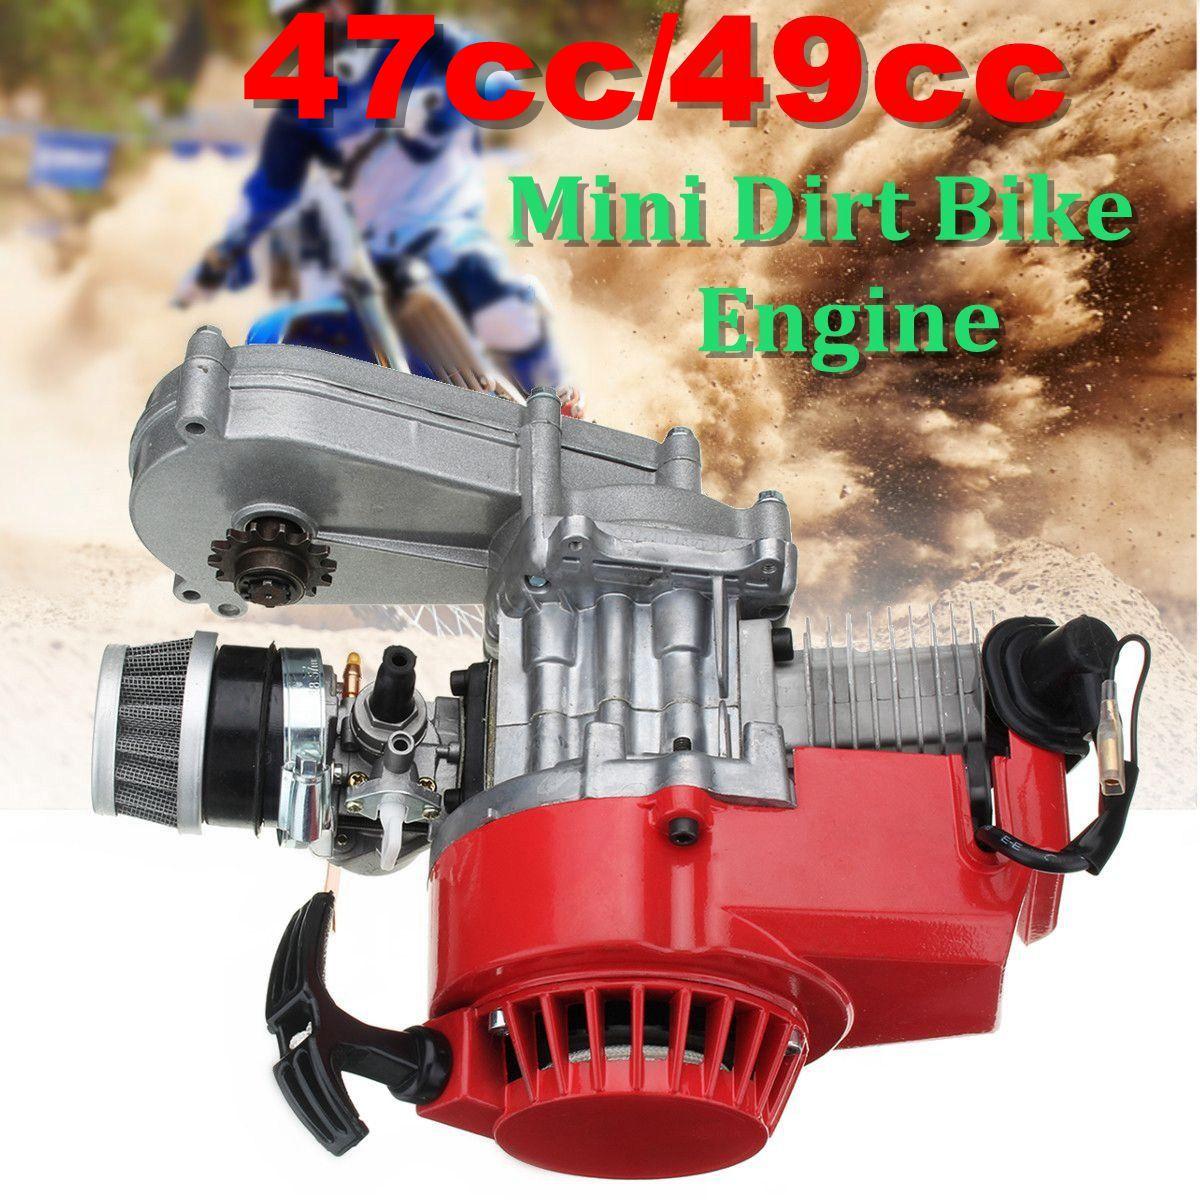 47cc 49cc Engine 2 Stroke Pull Start Motor w Transfer Box Red For Mini Dirt Bike